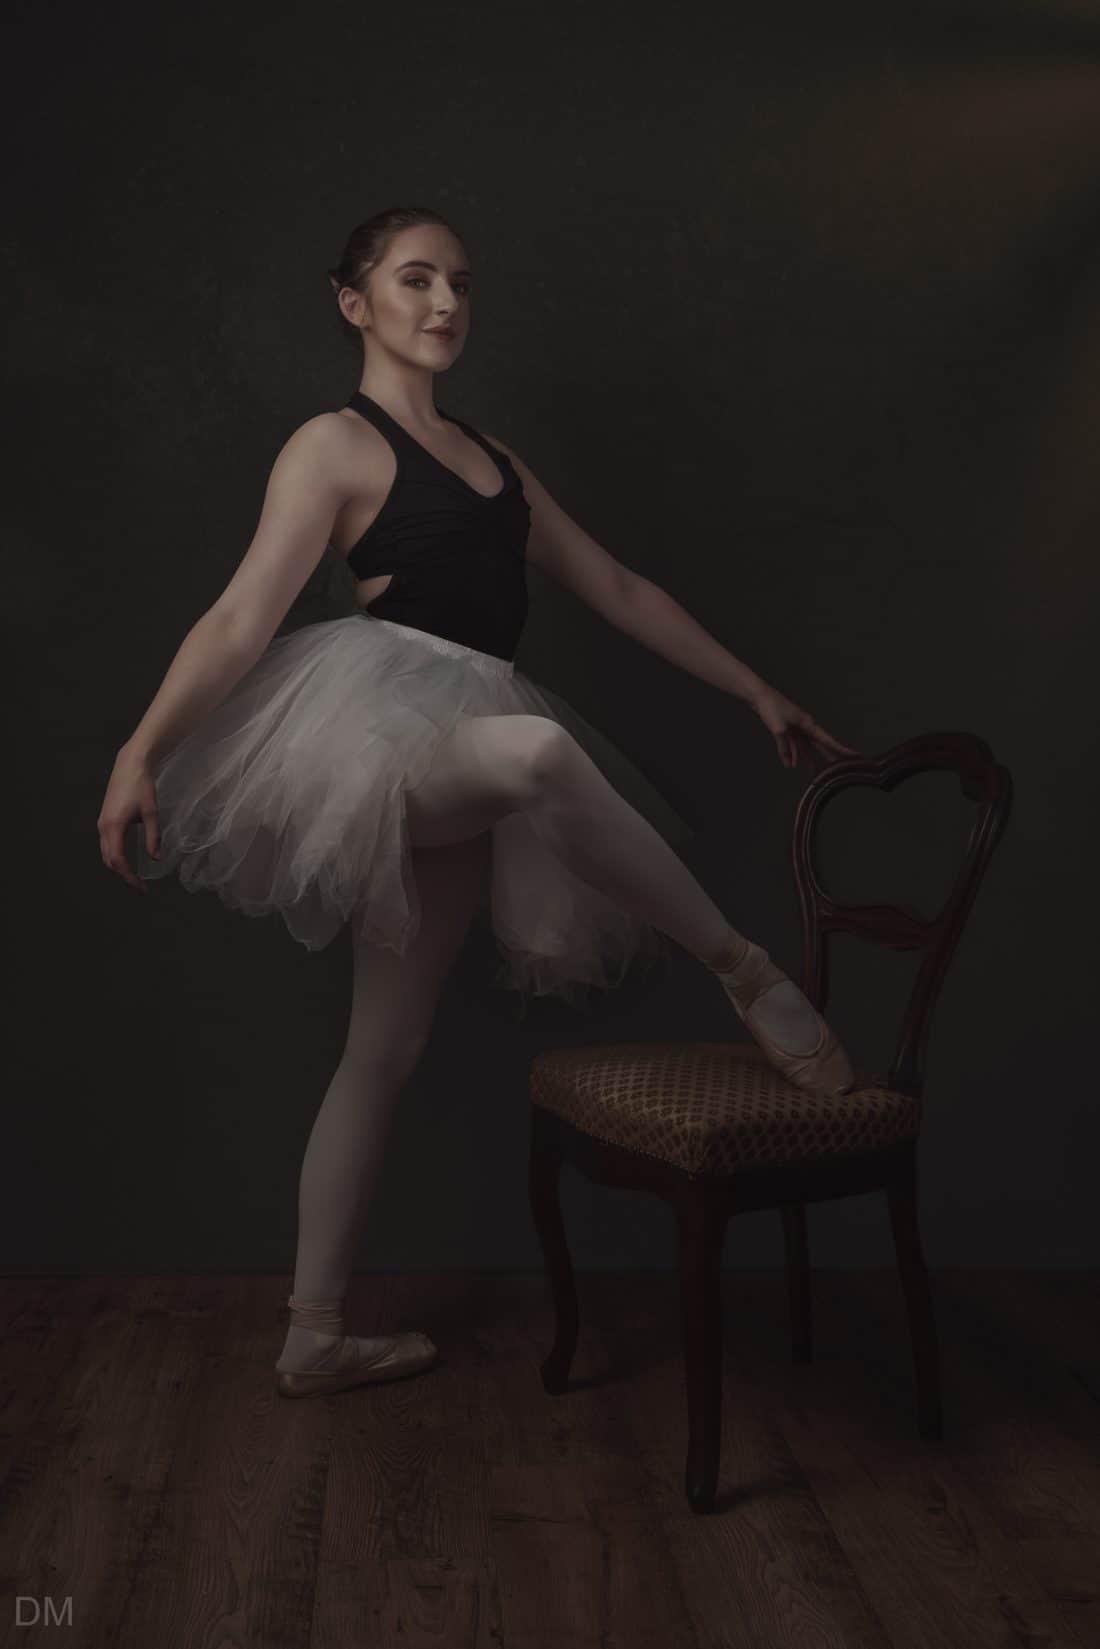 Photograph of a female ballerina wearing a tutu